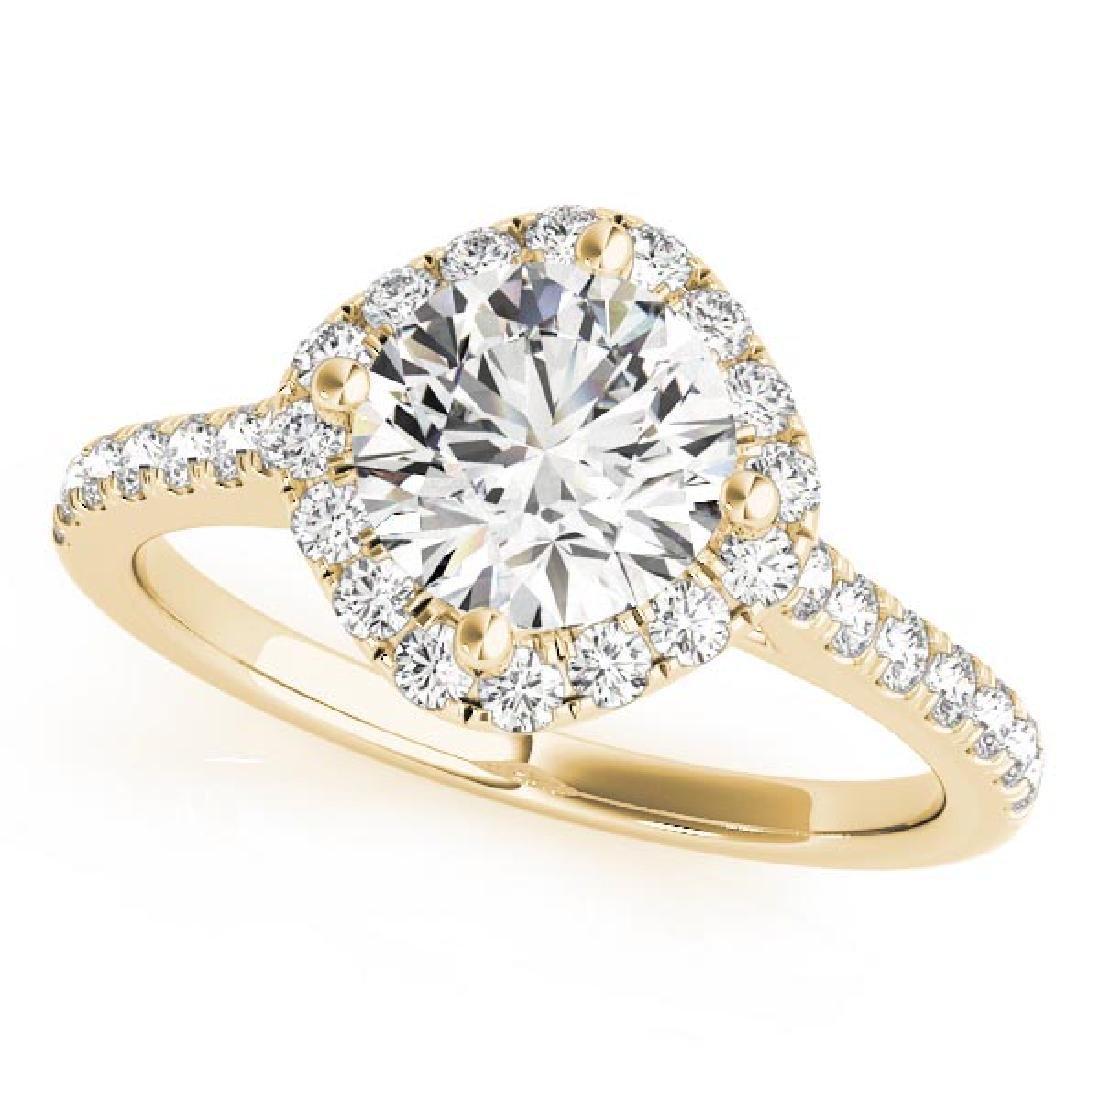 CERTIFIED 18K YELLOW GOLD 1.55 CT G-H/VS-SI1 DIAMOND HA